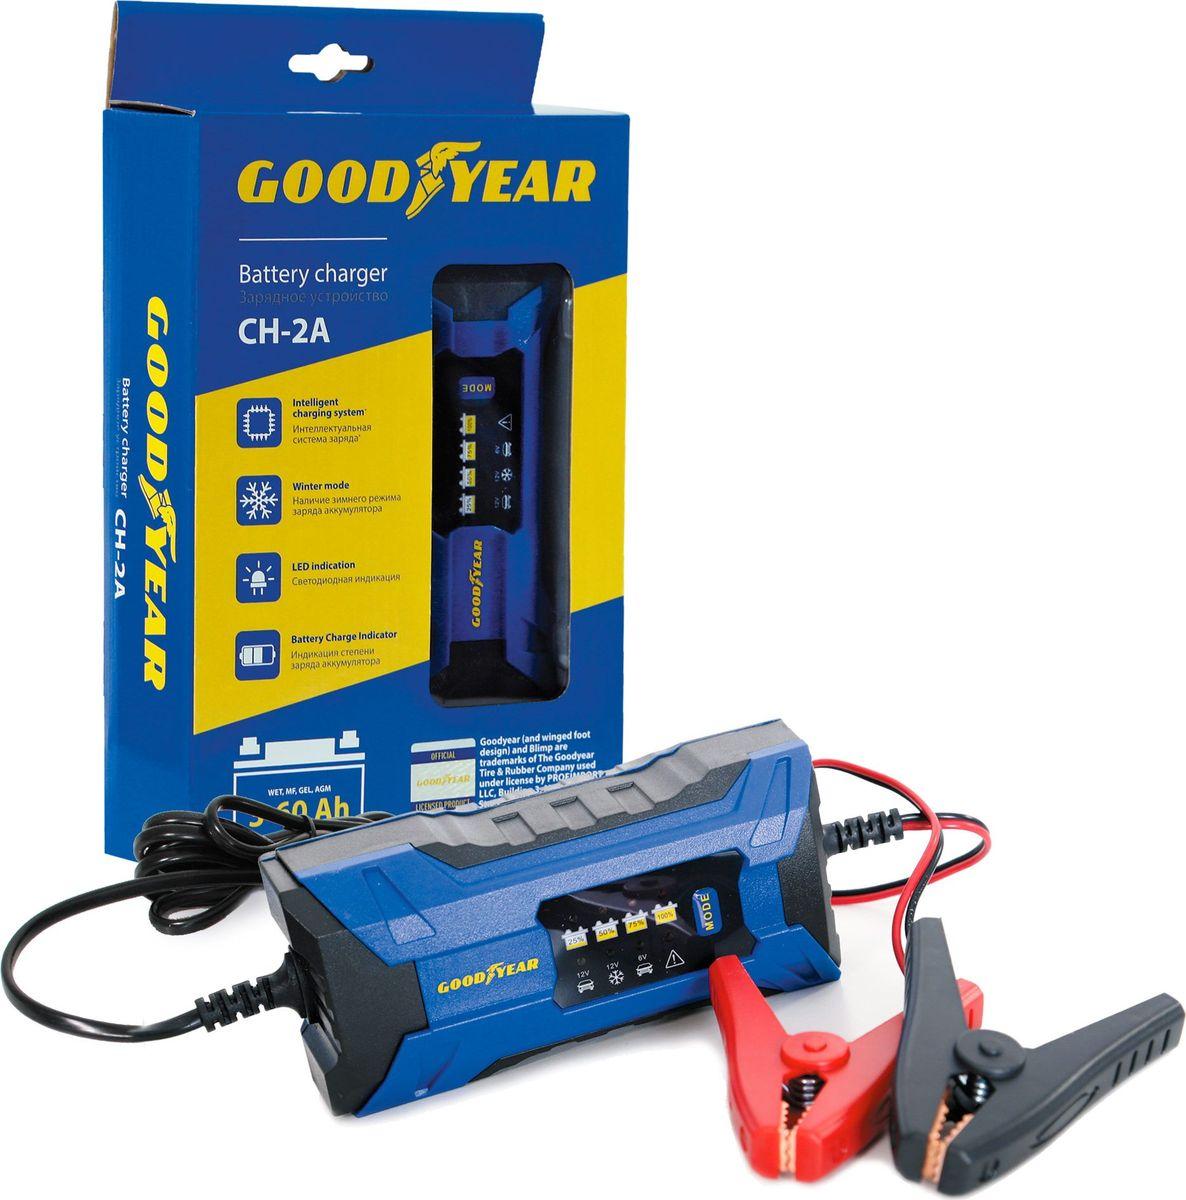 Электронное зарядное устройство Goodyear, для свинцово-кислотных аккумуляторов CH-2A портативное зарядное устройство mango device fancy mf 10000 10000mah 2a mf 10000bl